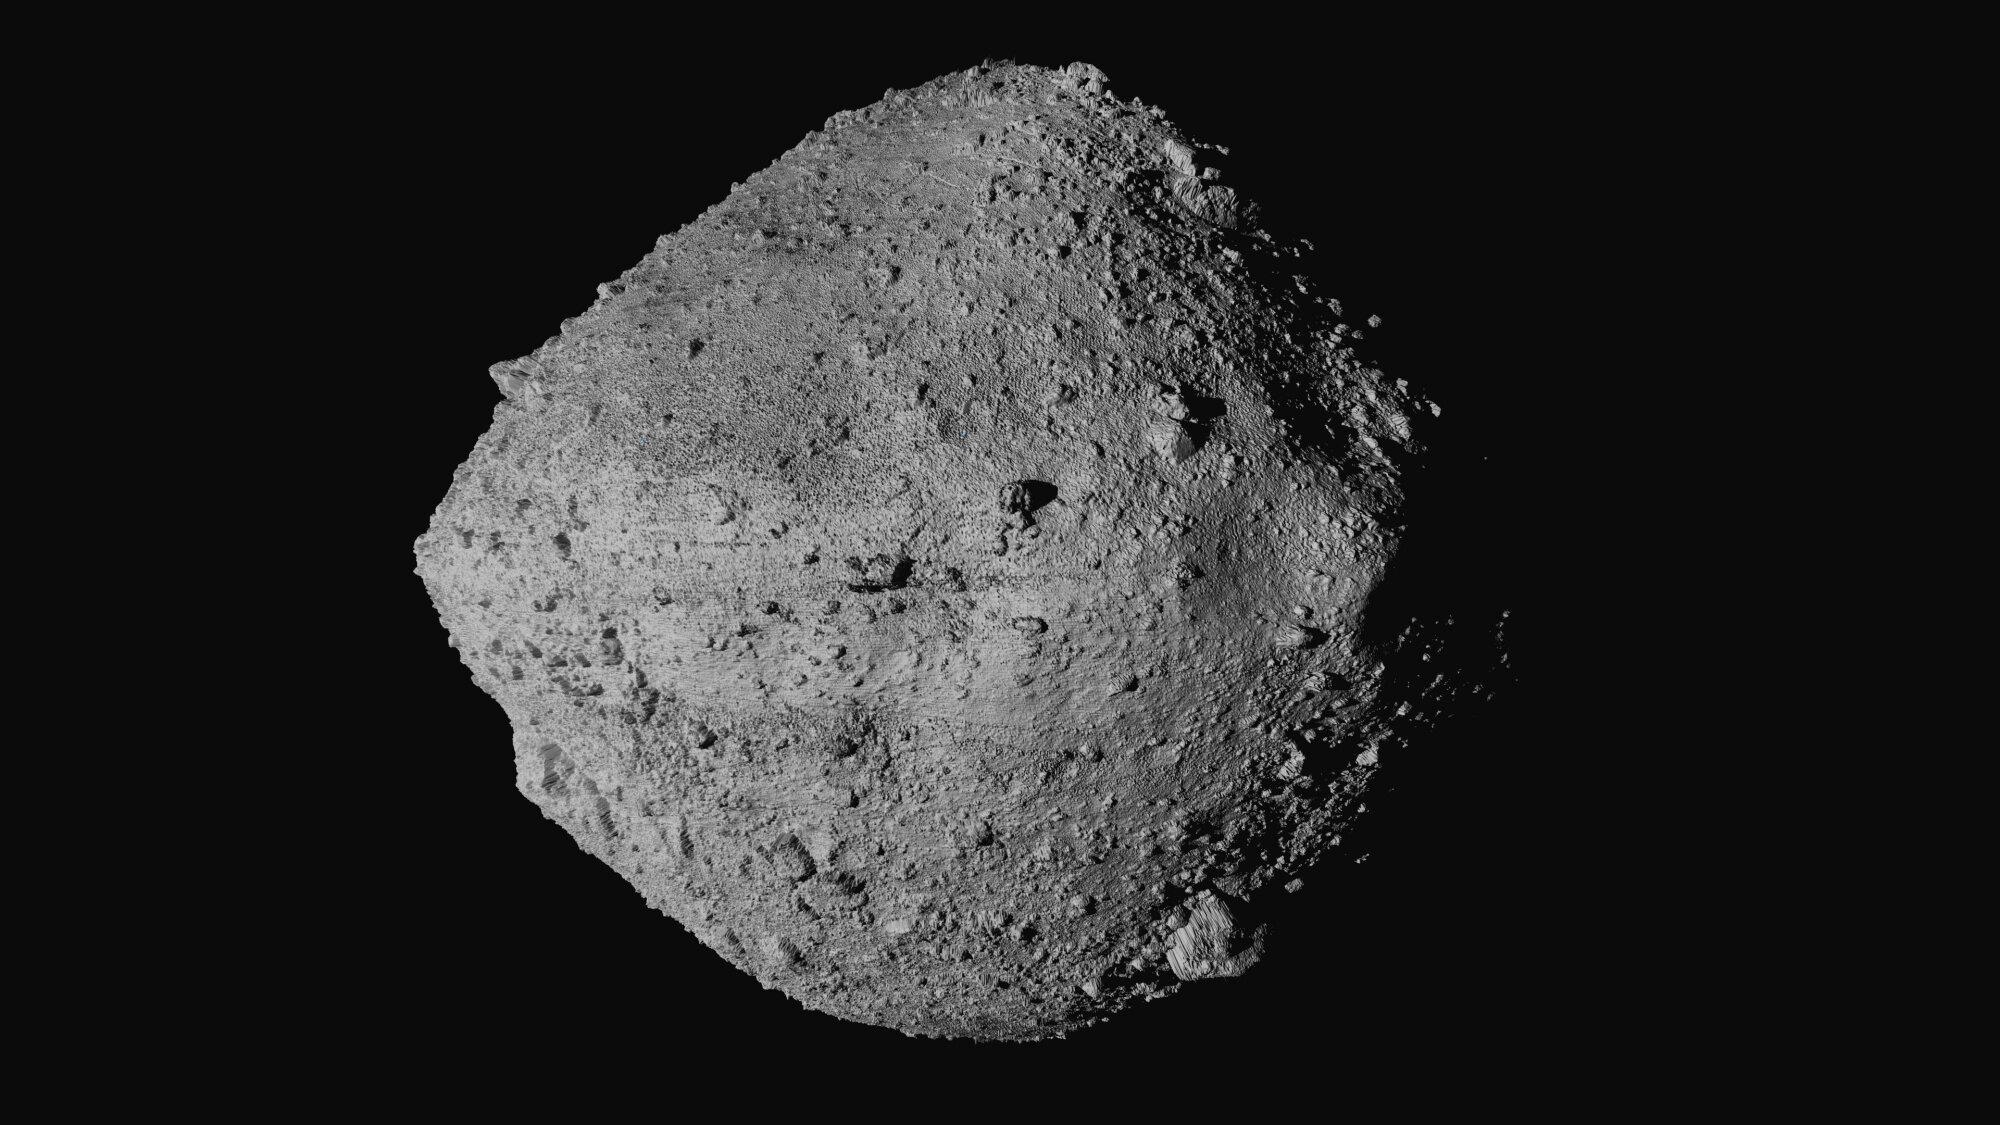 US spacecraft sampling asteroid for return